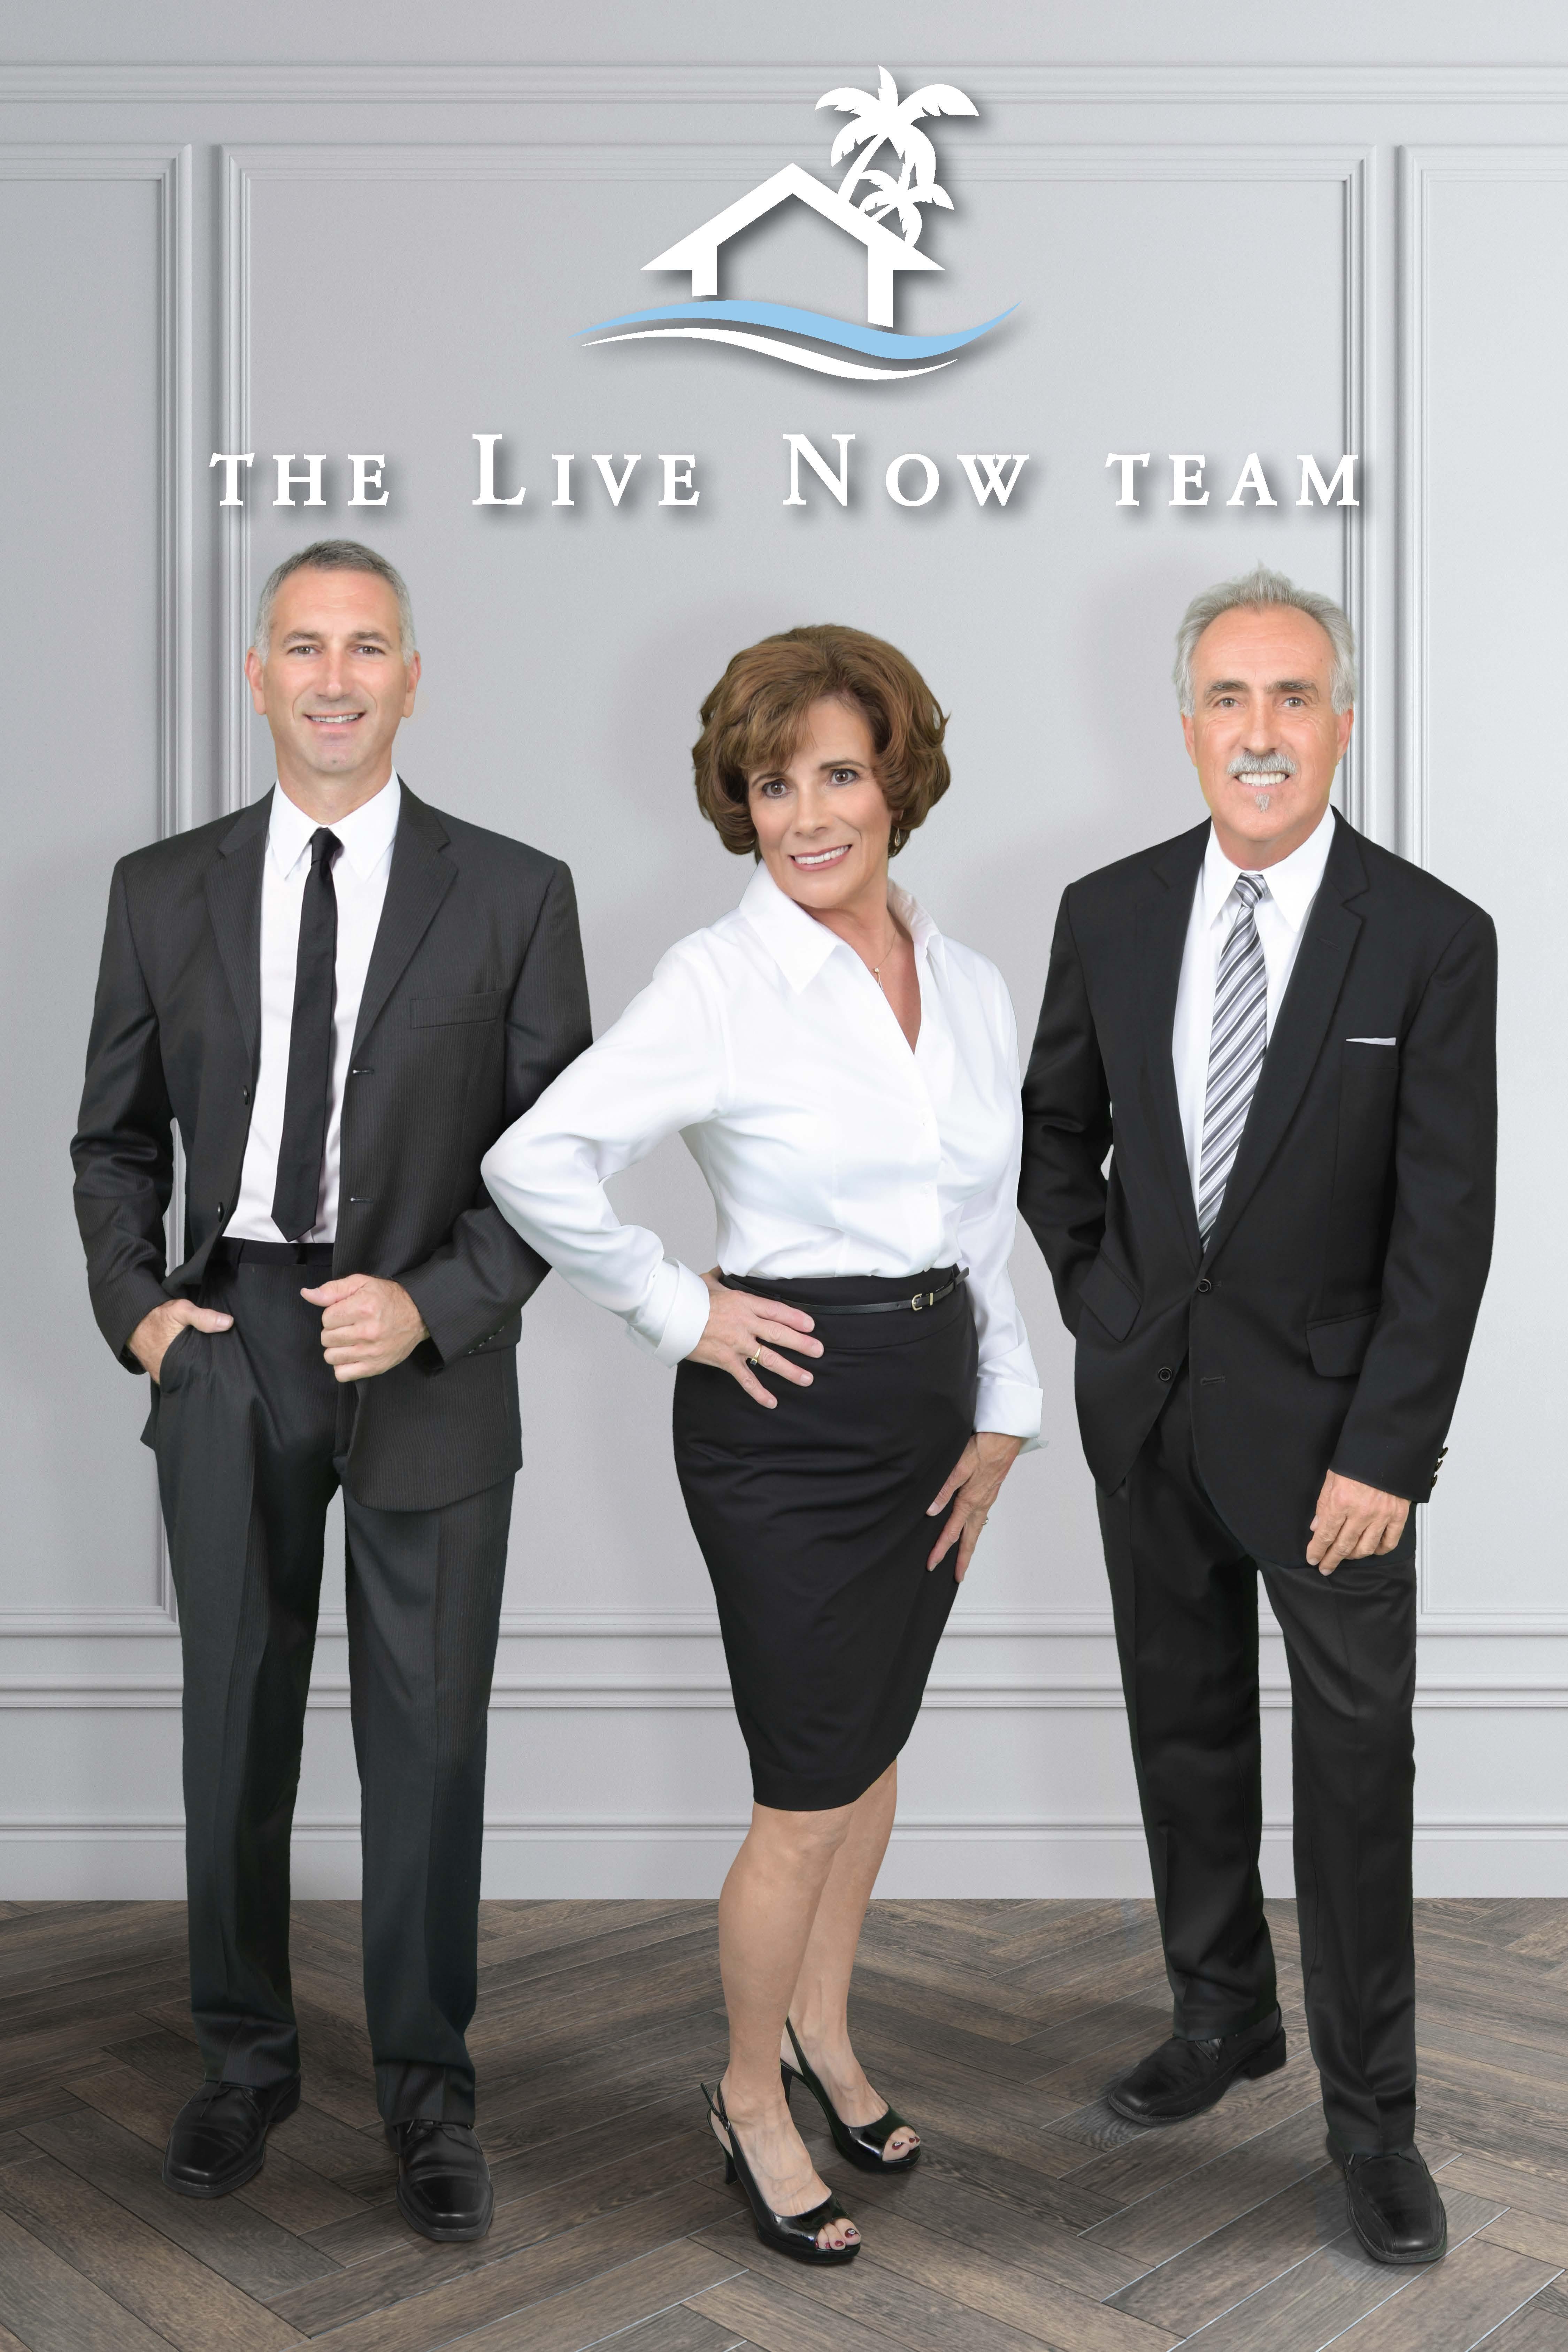 The Live Now Team - Scott, Carolyn & Jim